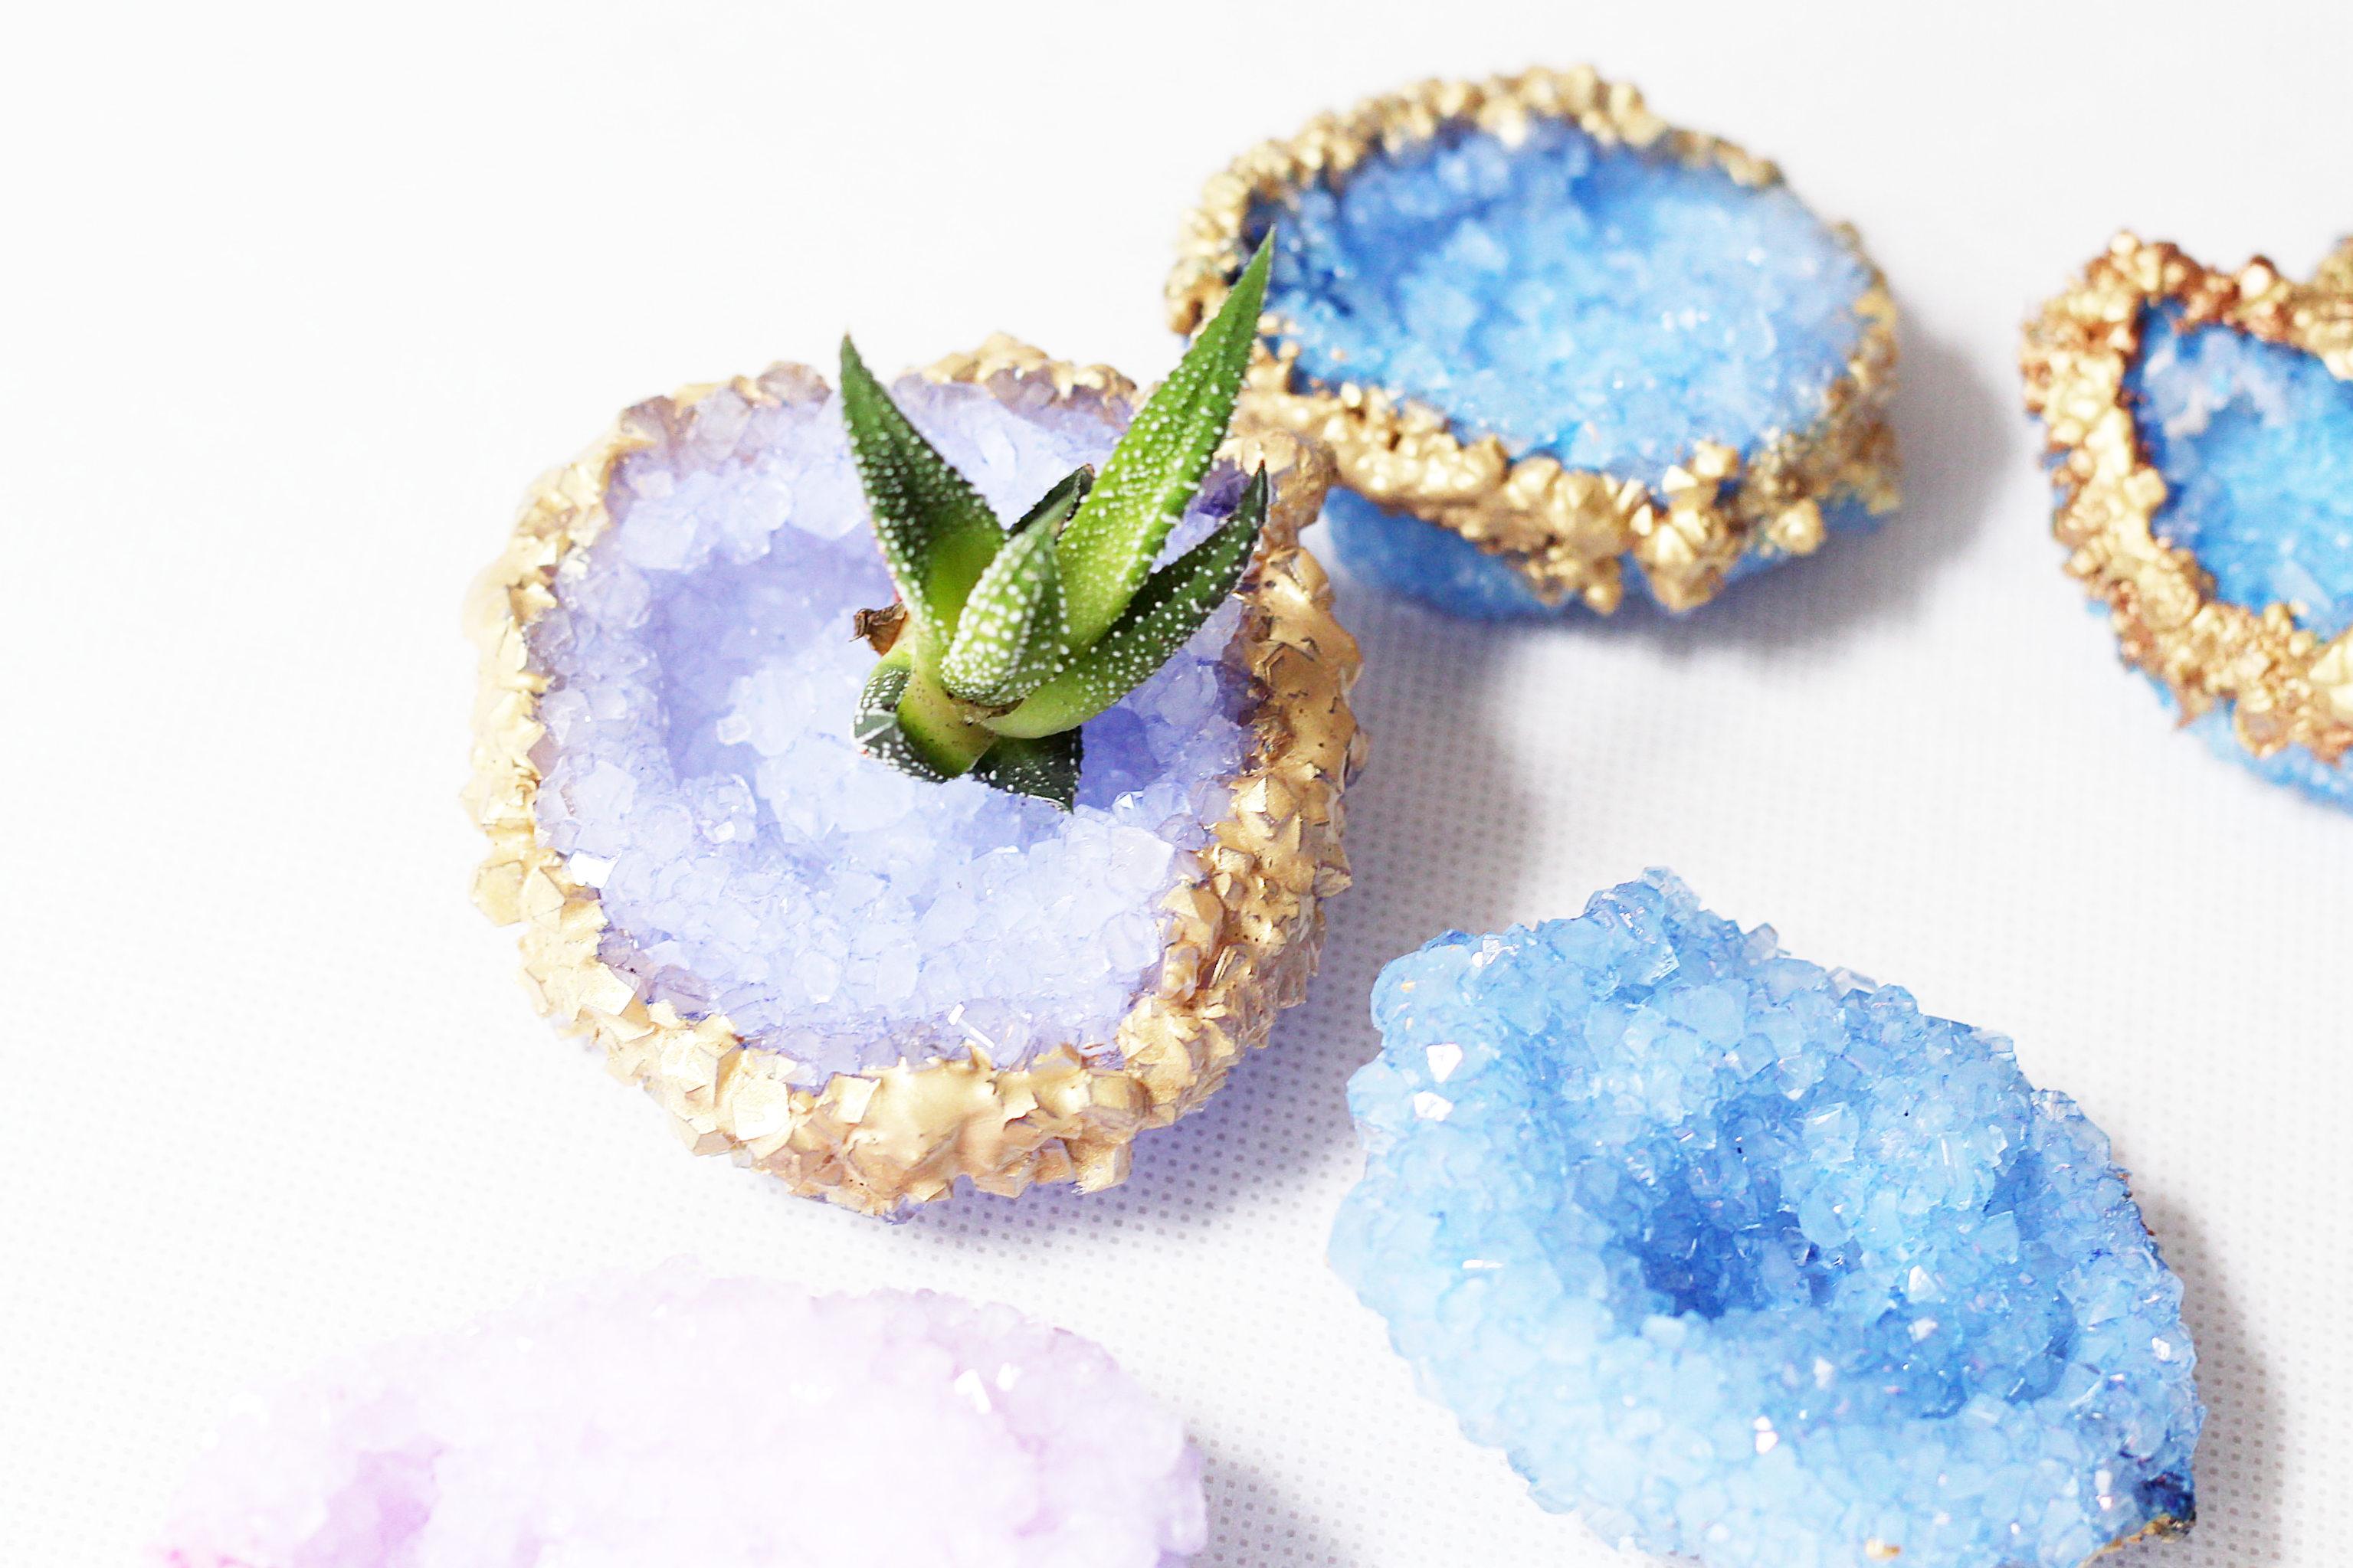 Kristalle-selber-züchten